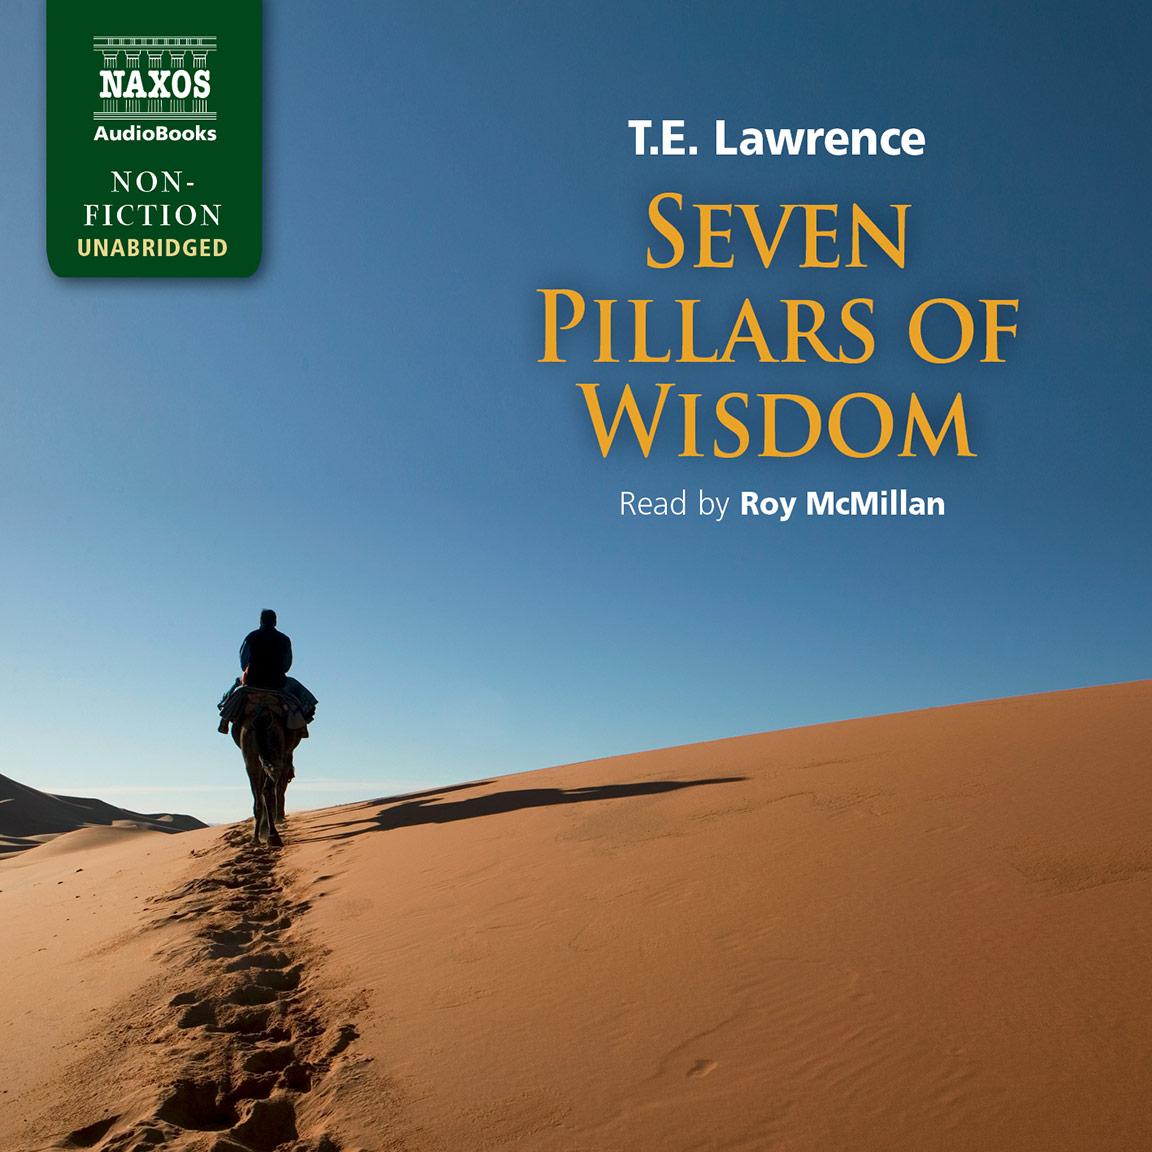 Seven Pillars of Wisdom (unabridged)